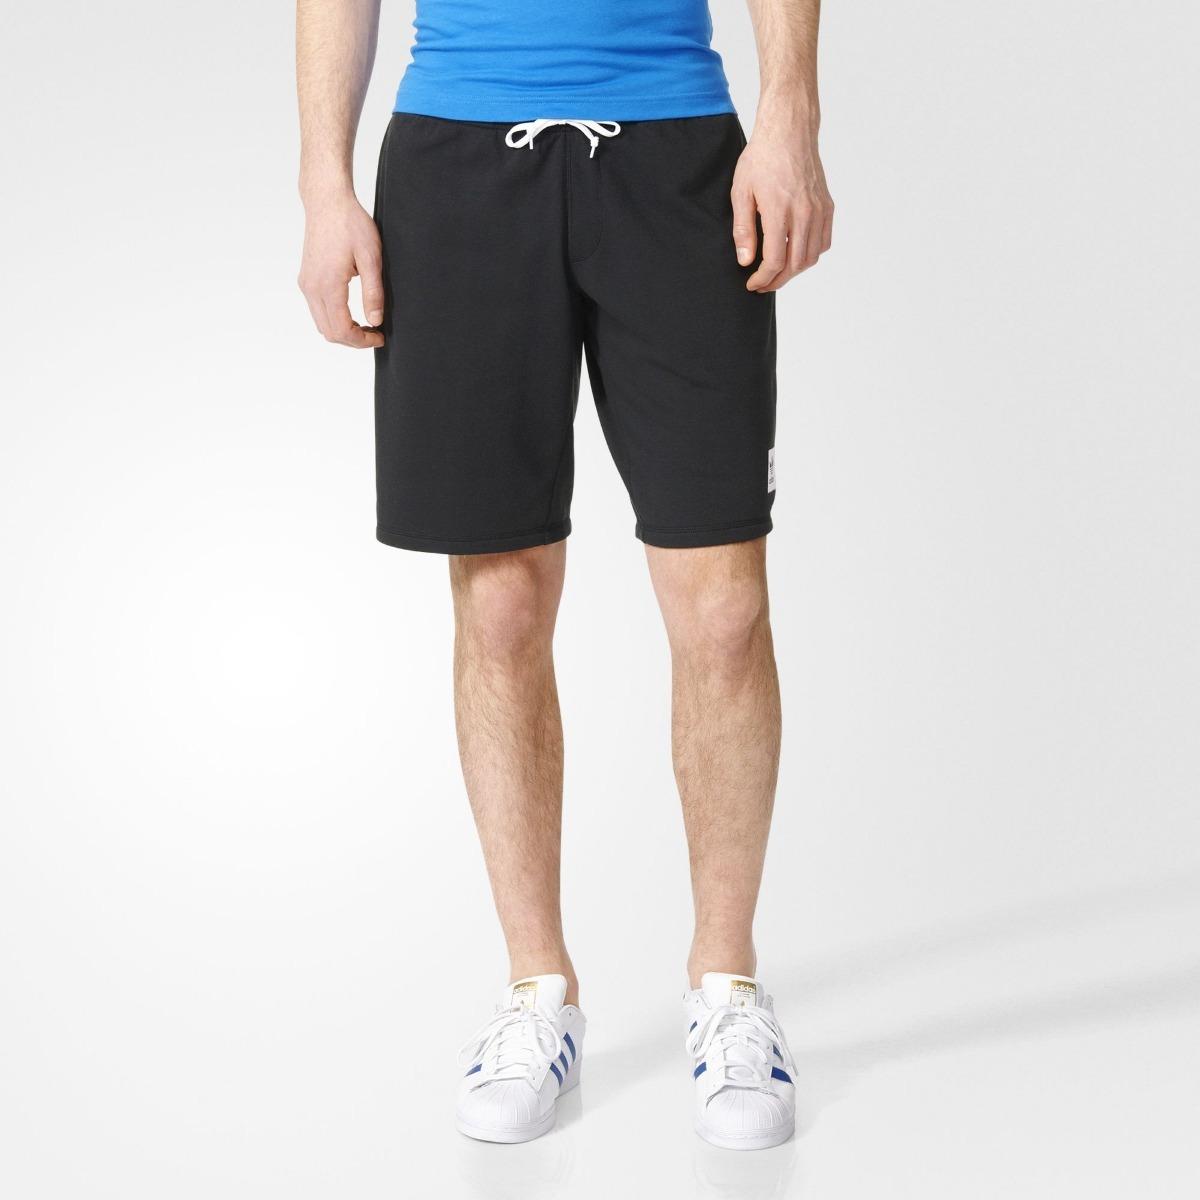 Mercado Bermuda Adidas 699 00 Libre En Clima Blackbird Originals waFw7q0